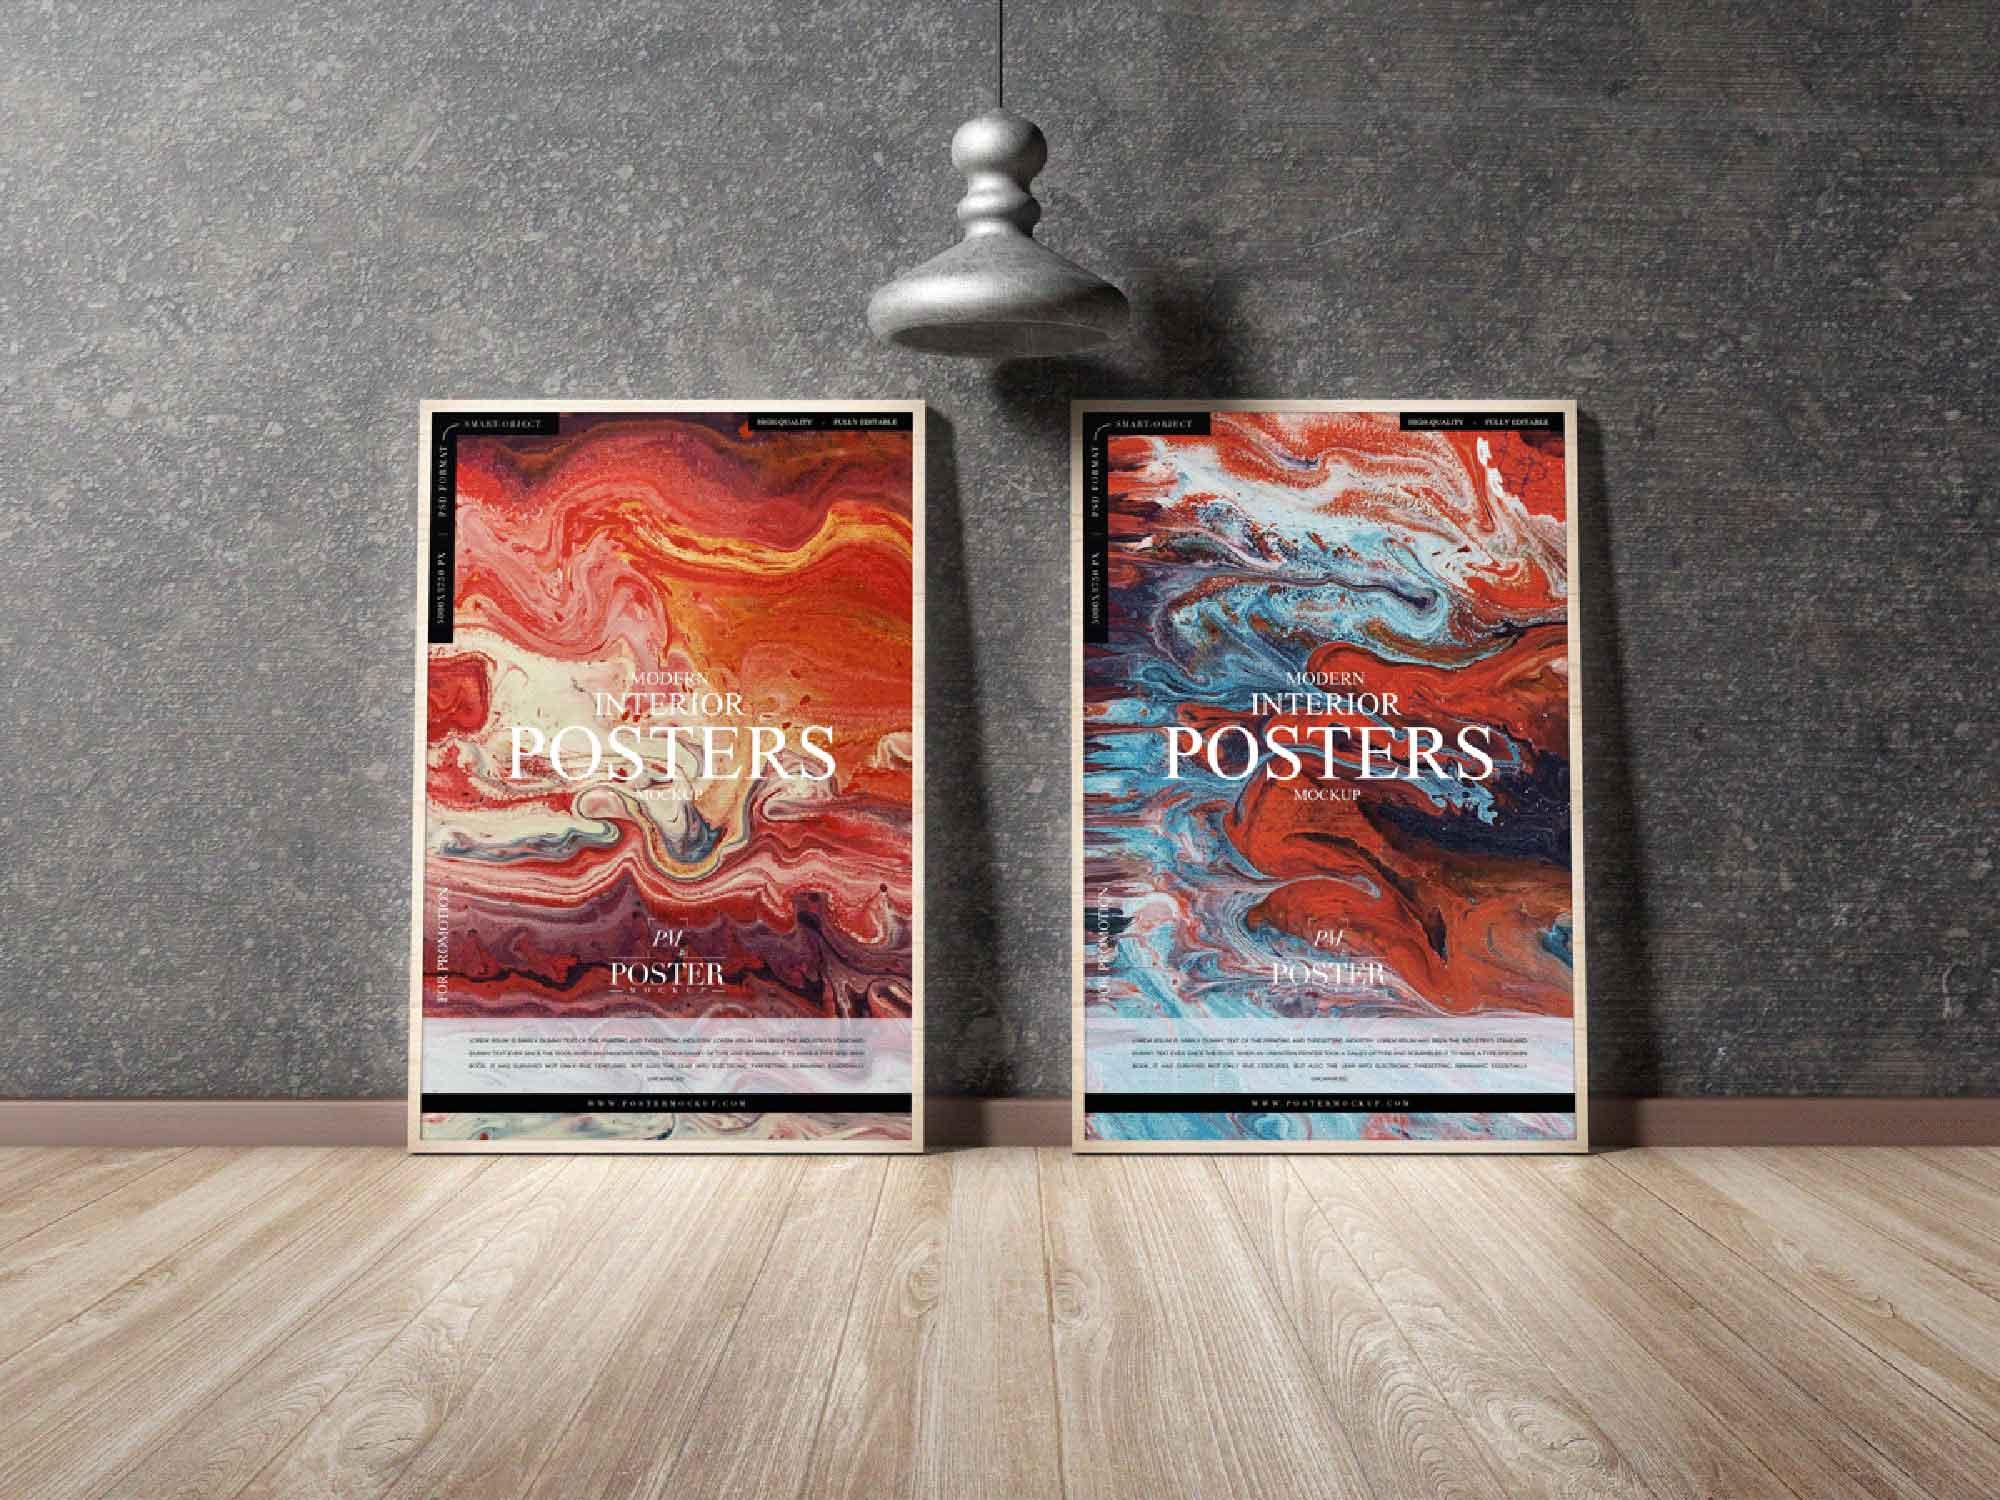 Twin Modern Interior Posters Mockup